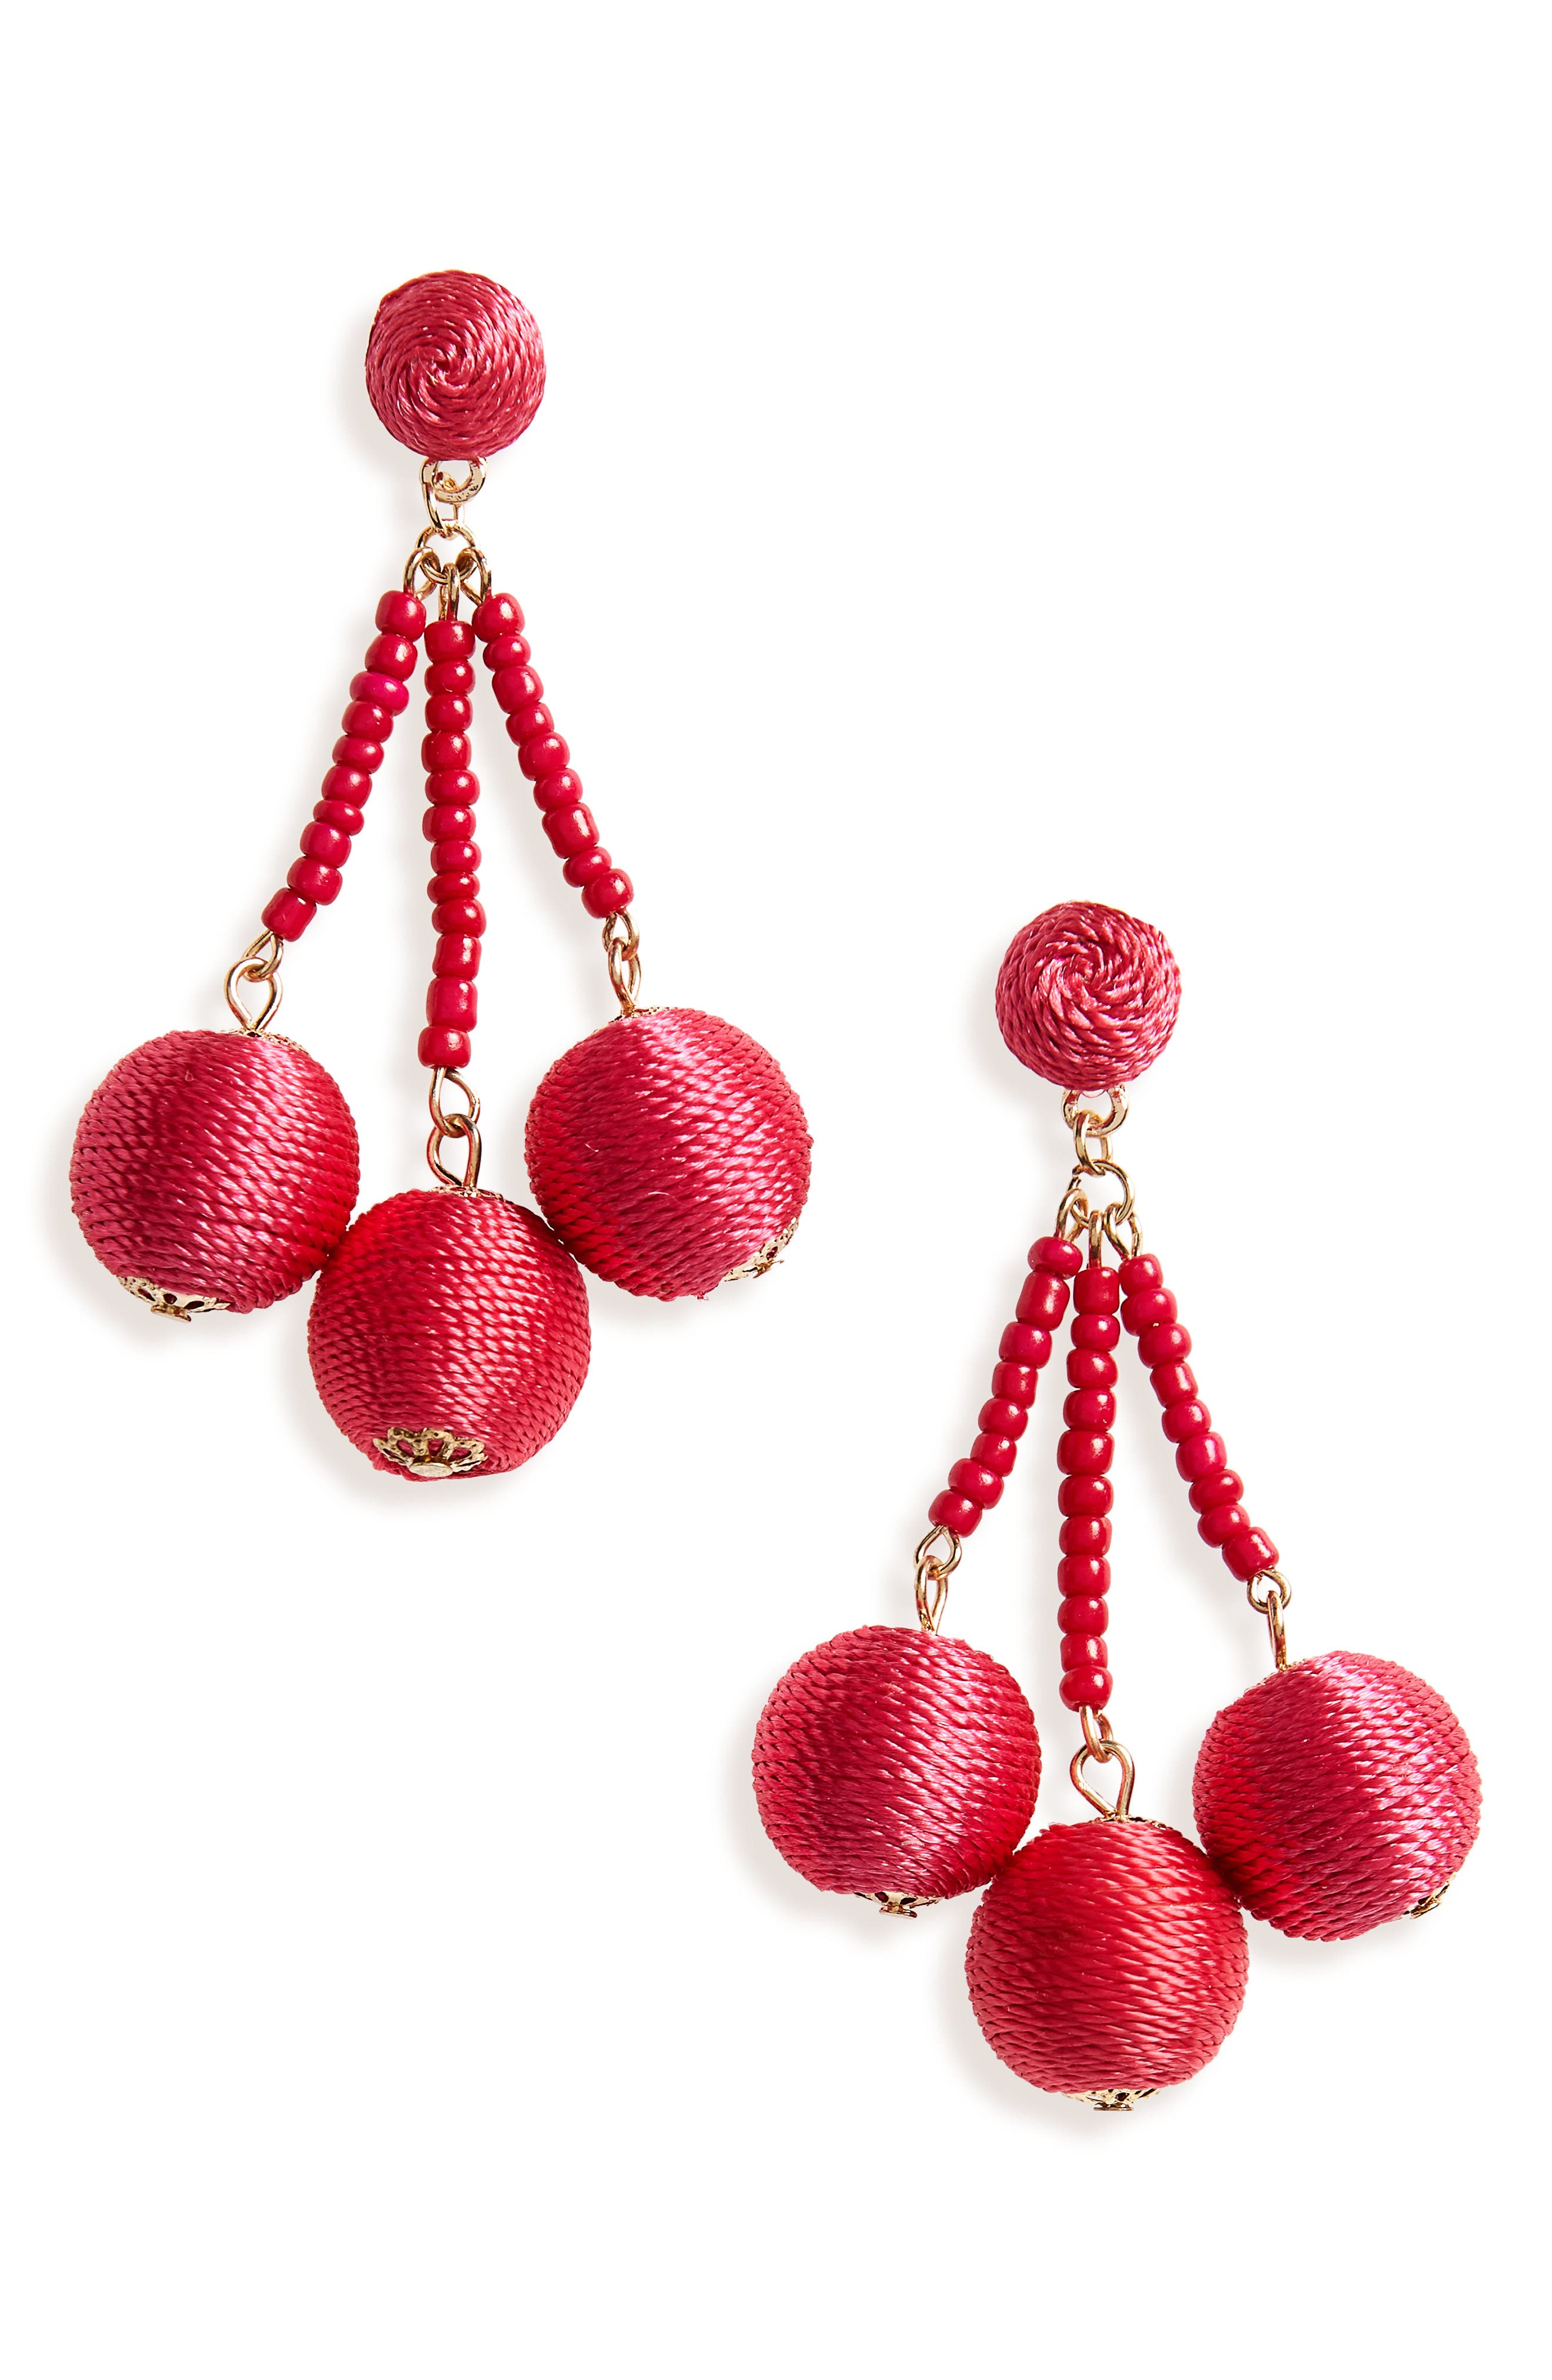 Sphere Drop Earrings,                             Main thumbnail 1, color,                             Pink Beetroot